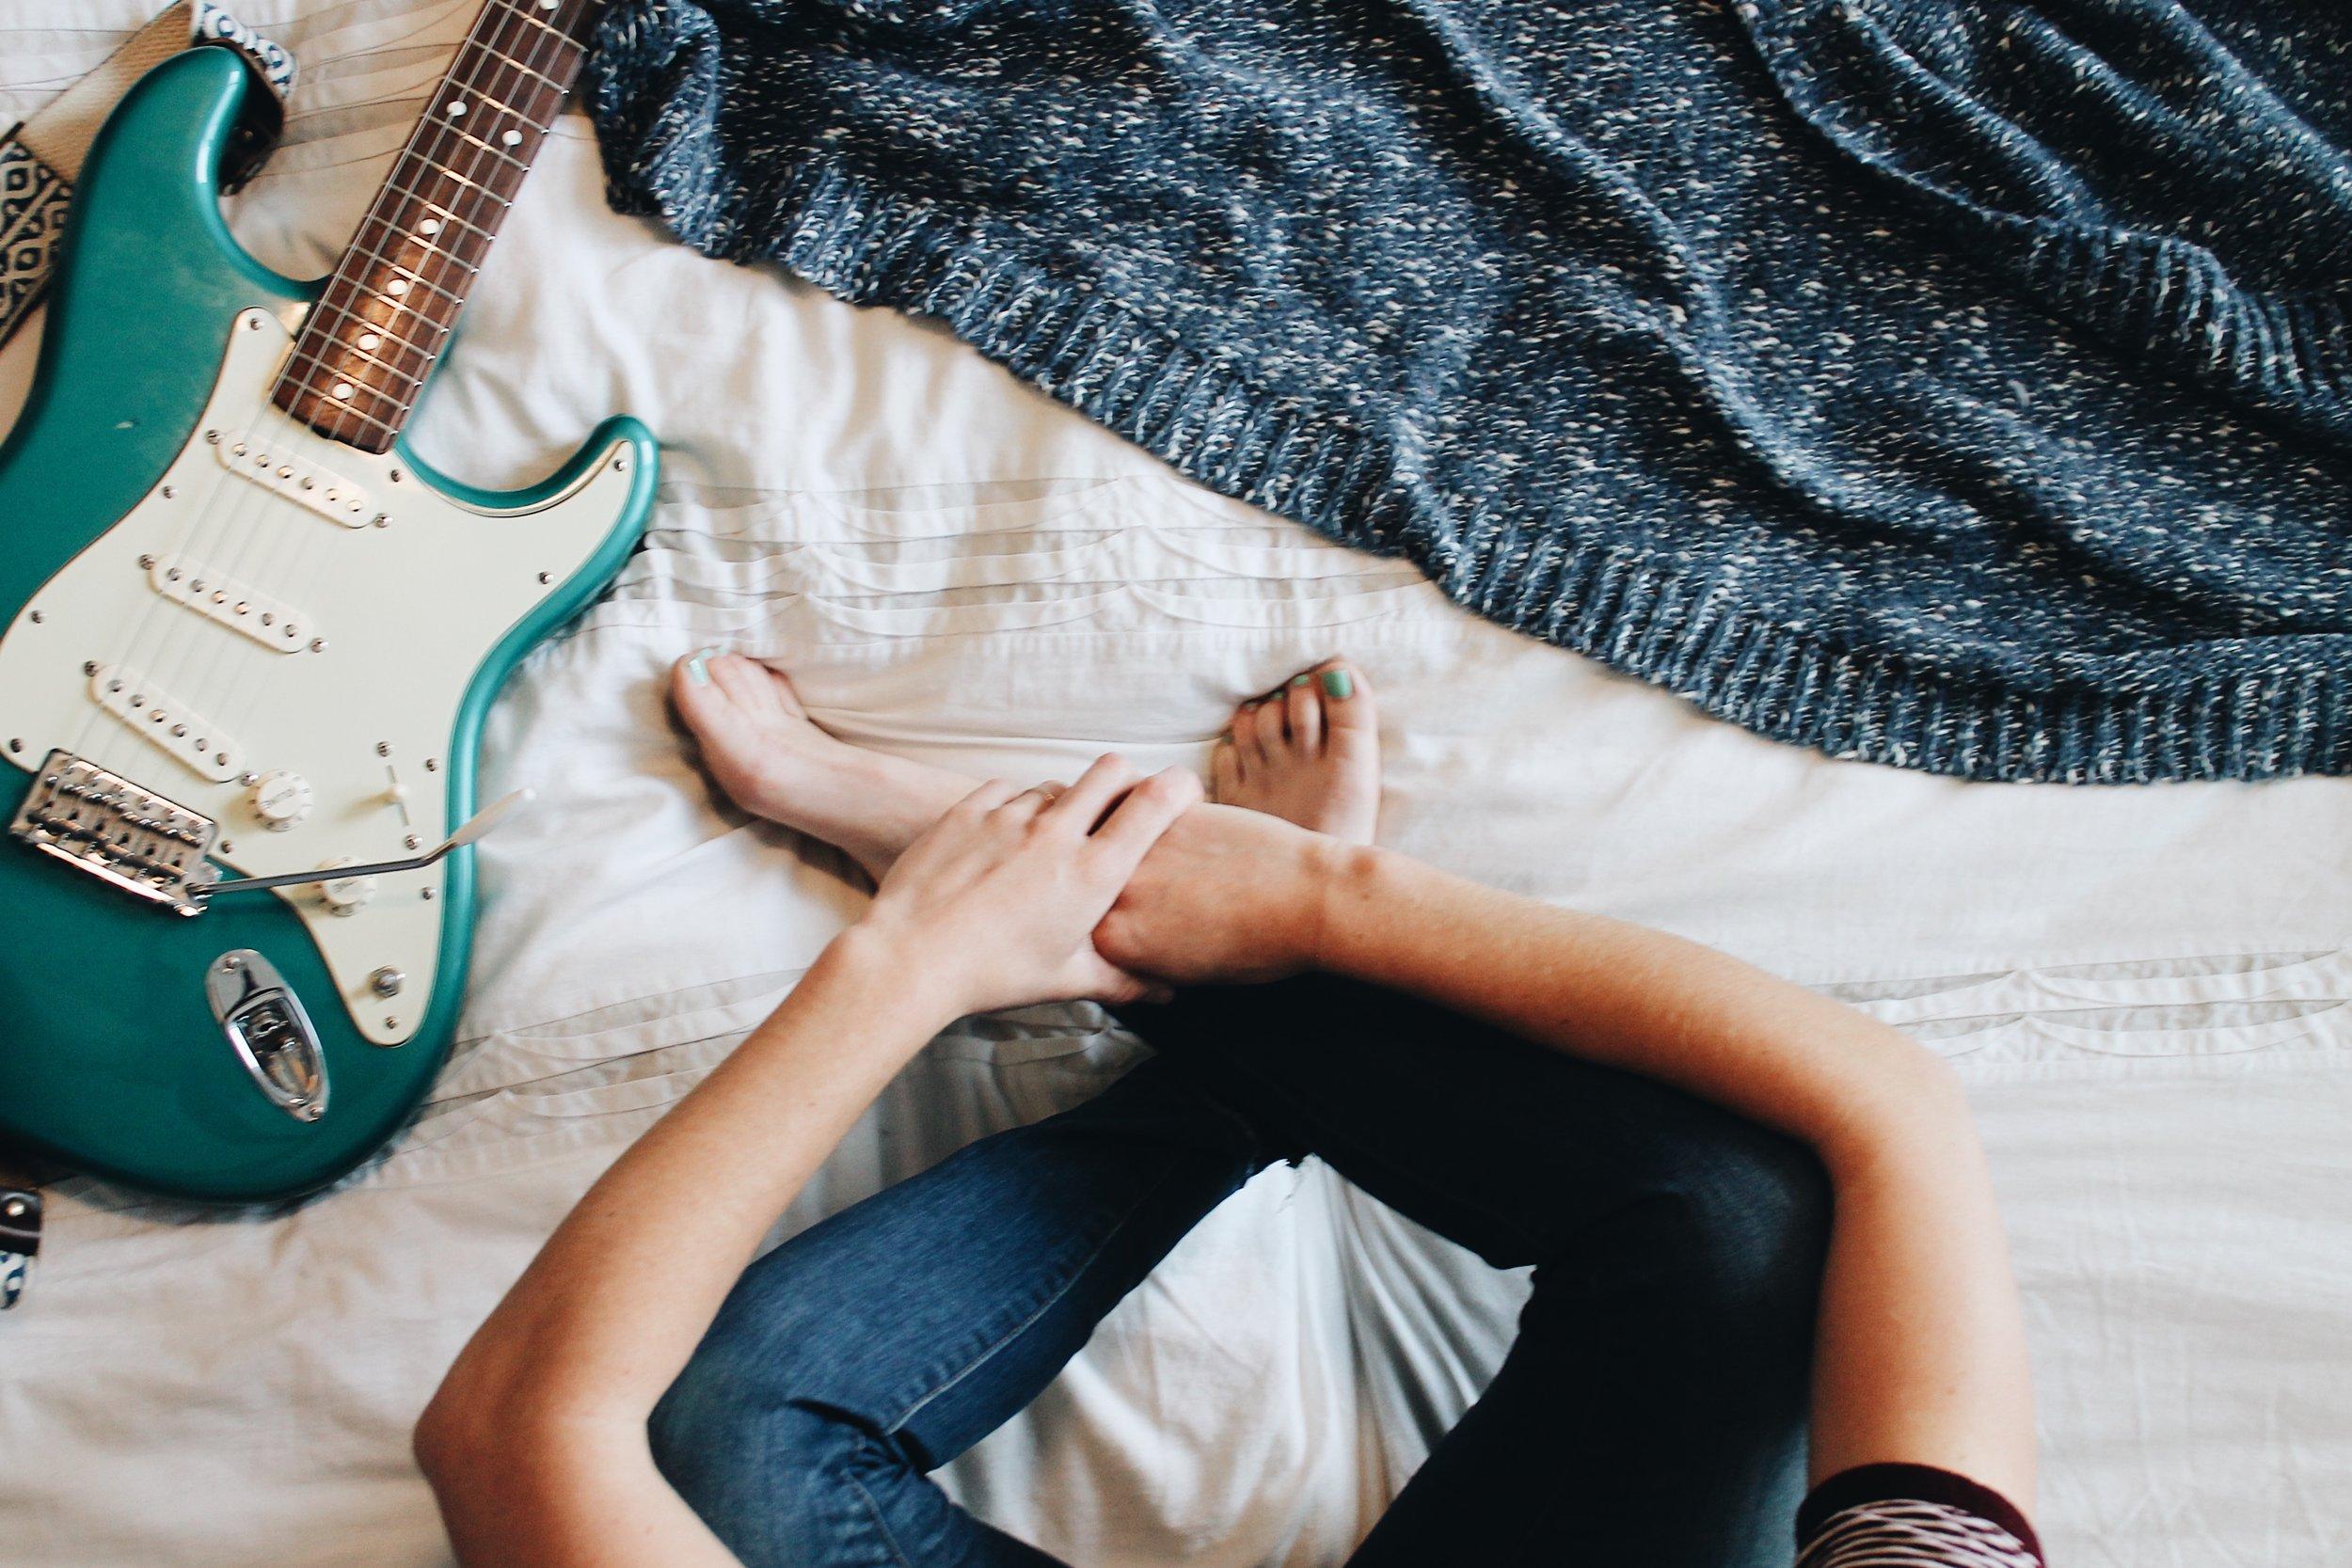 making guitar videos for instagram